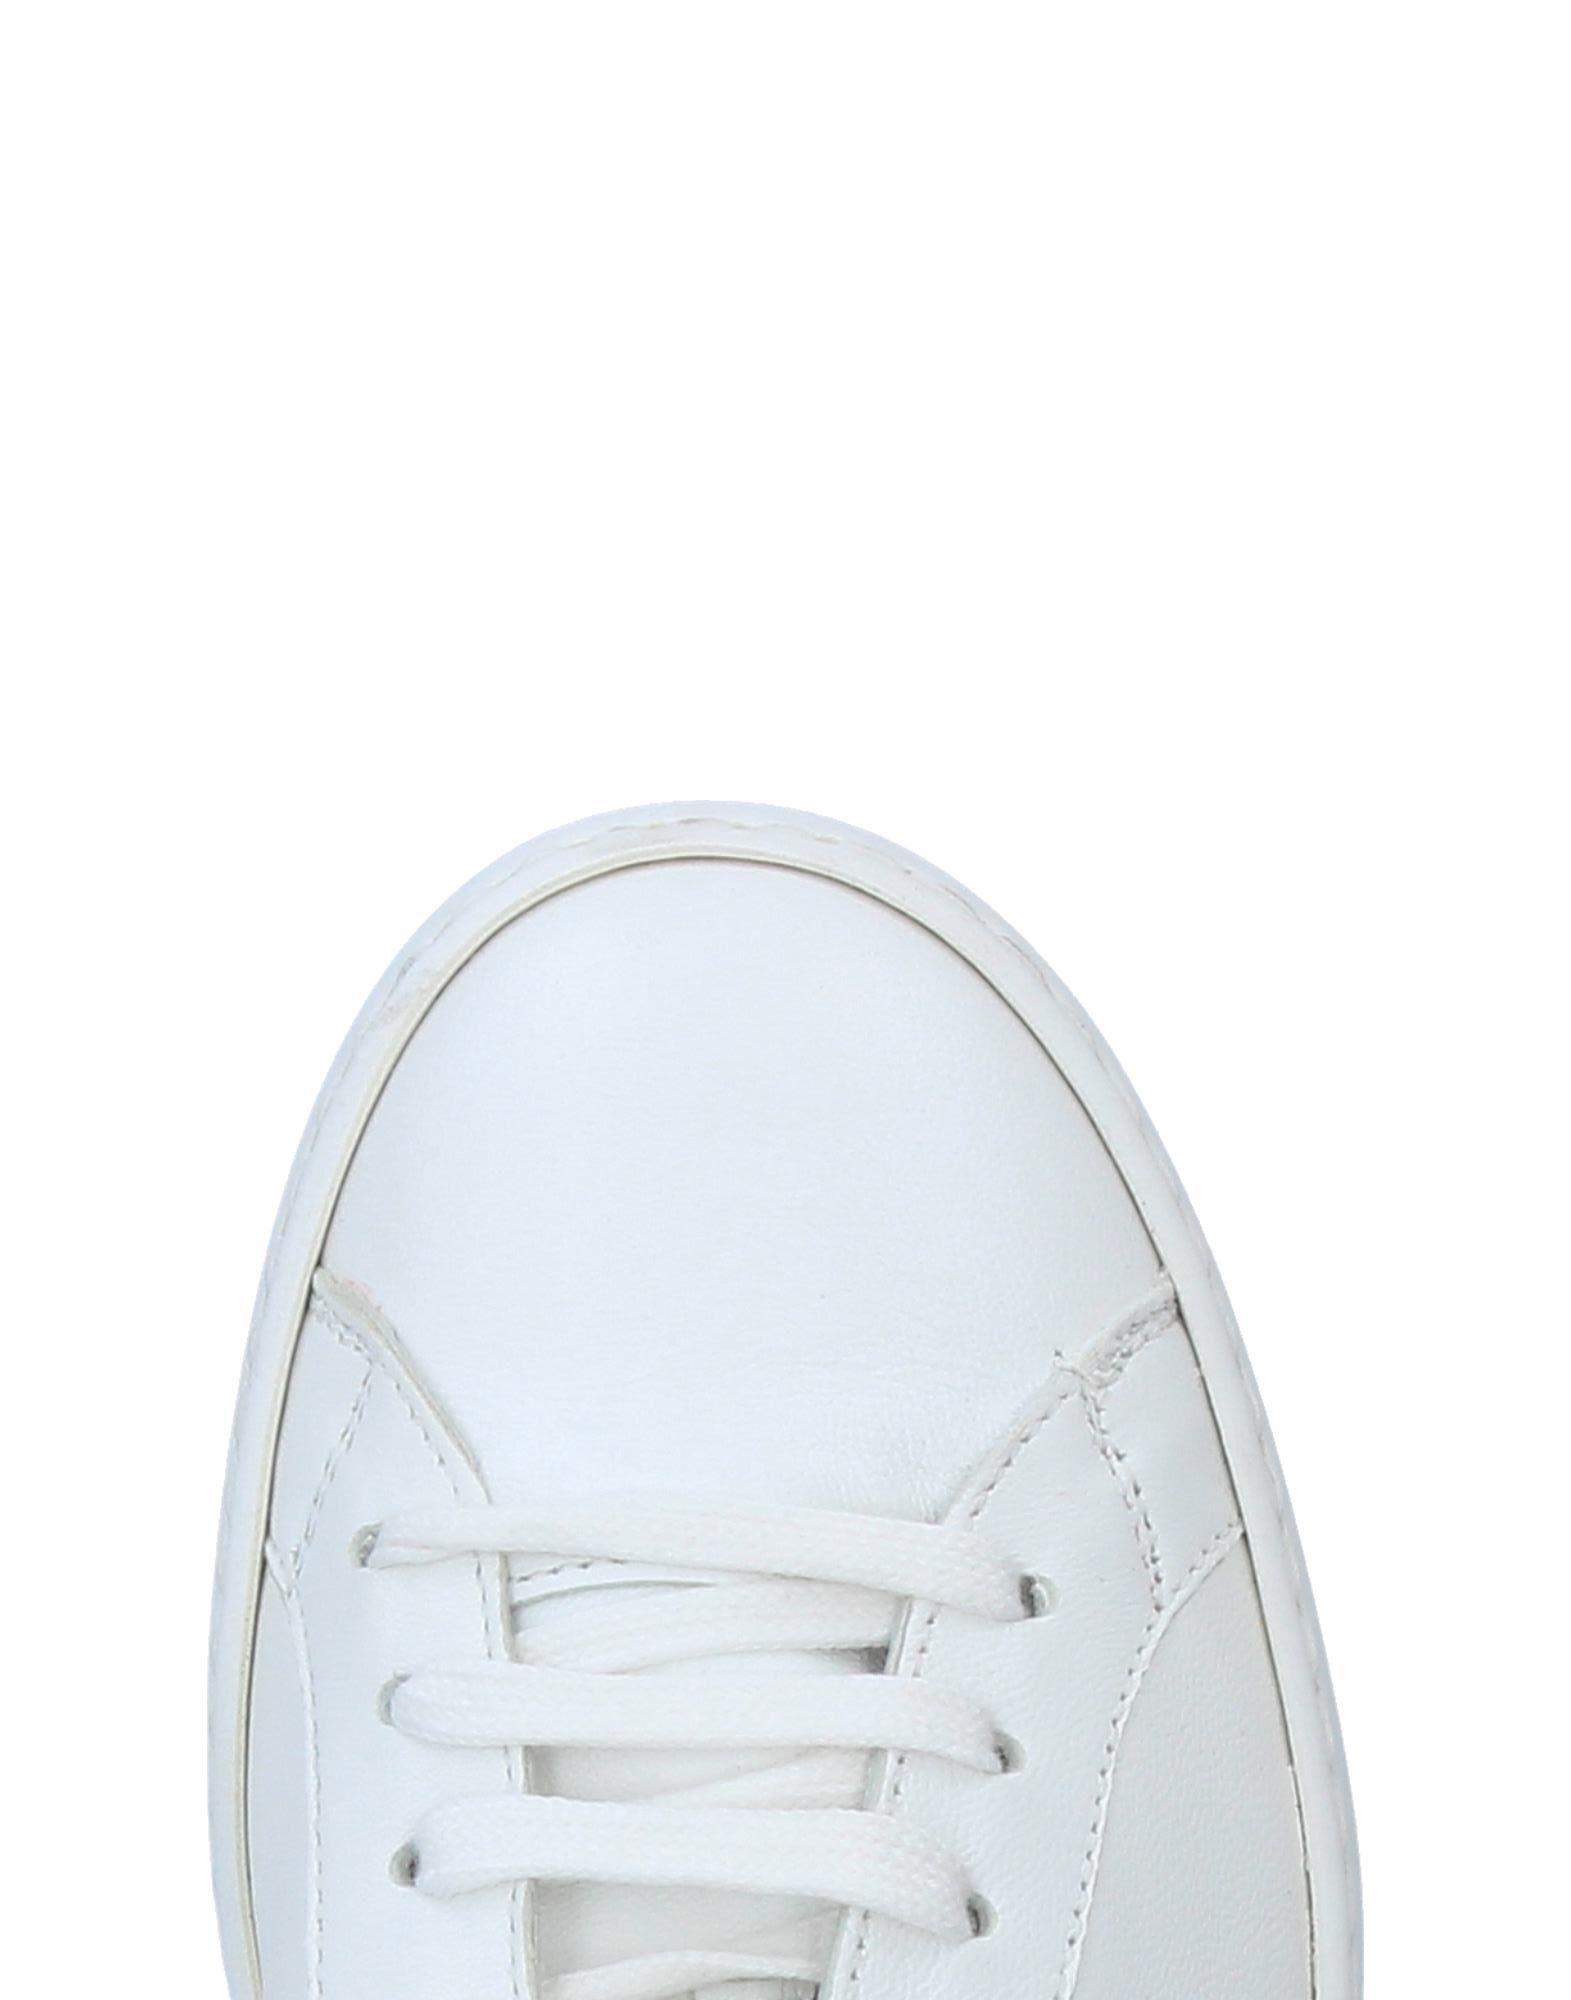 Haltbare Mode billige Schuhe Beliebte Jeremy 11367254XU Beliebte Schuhe Schuhe cccb05